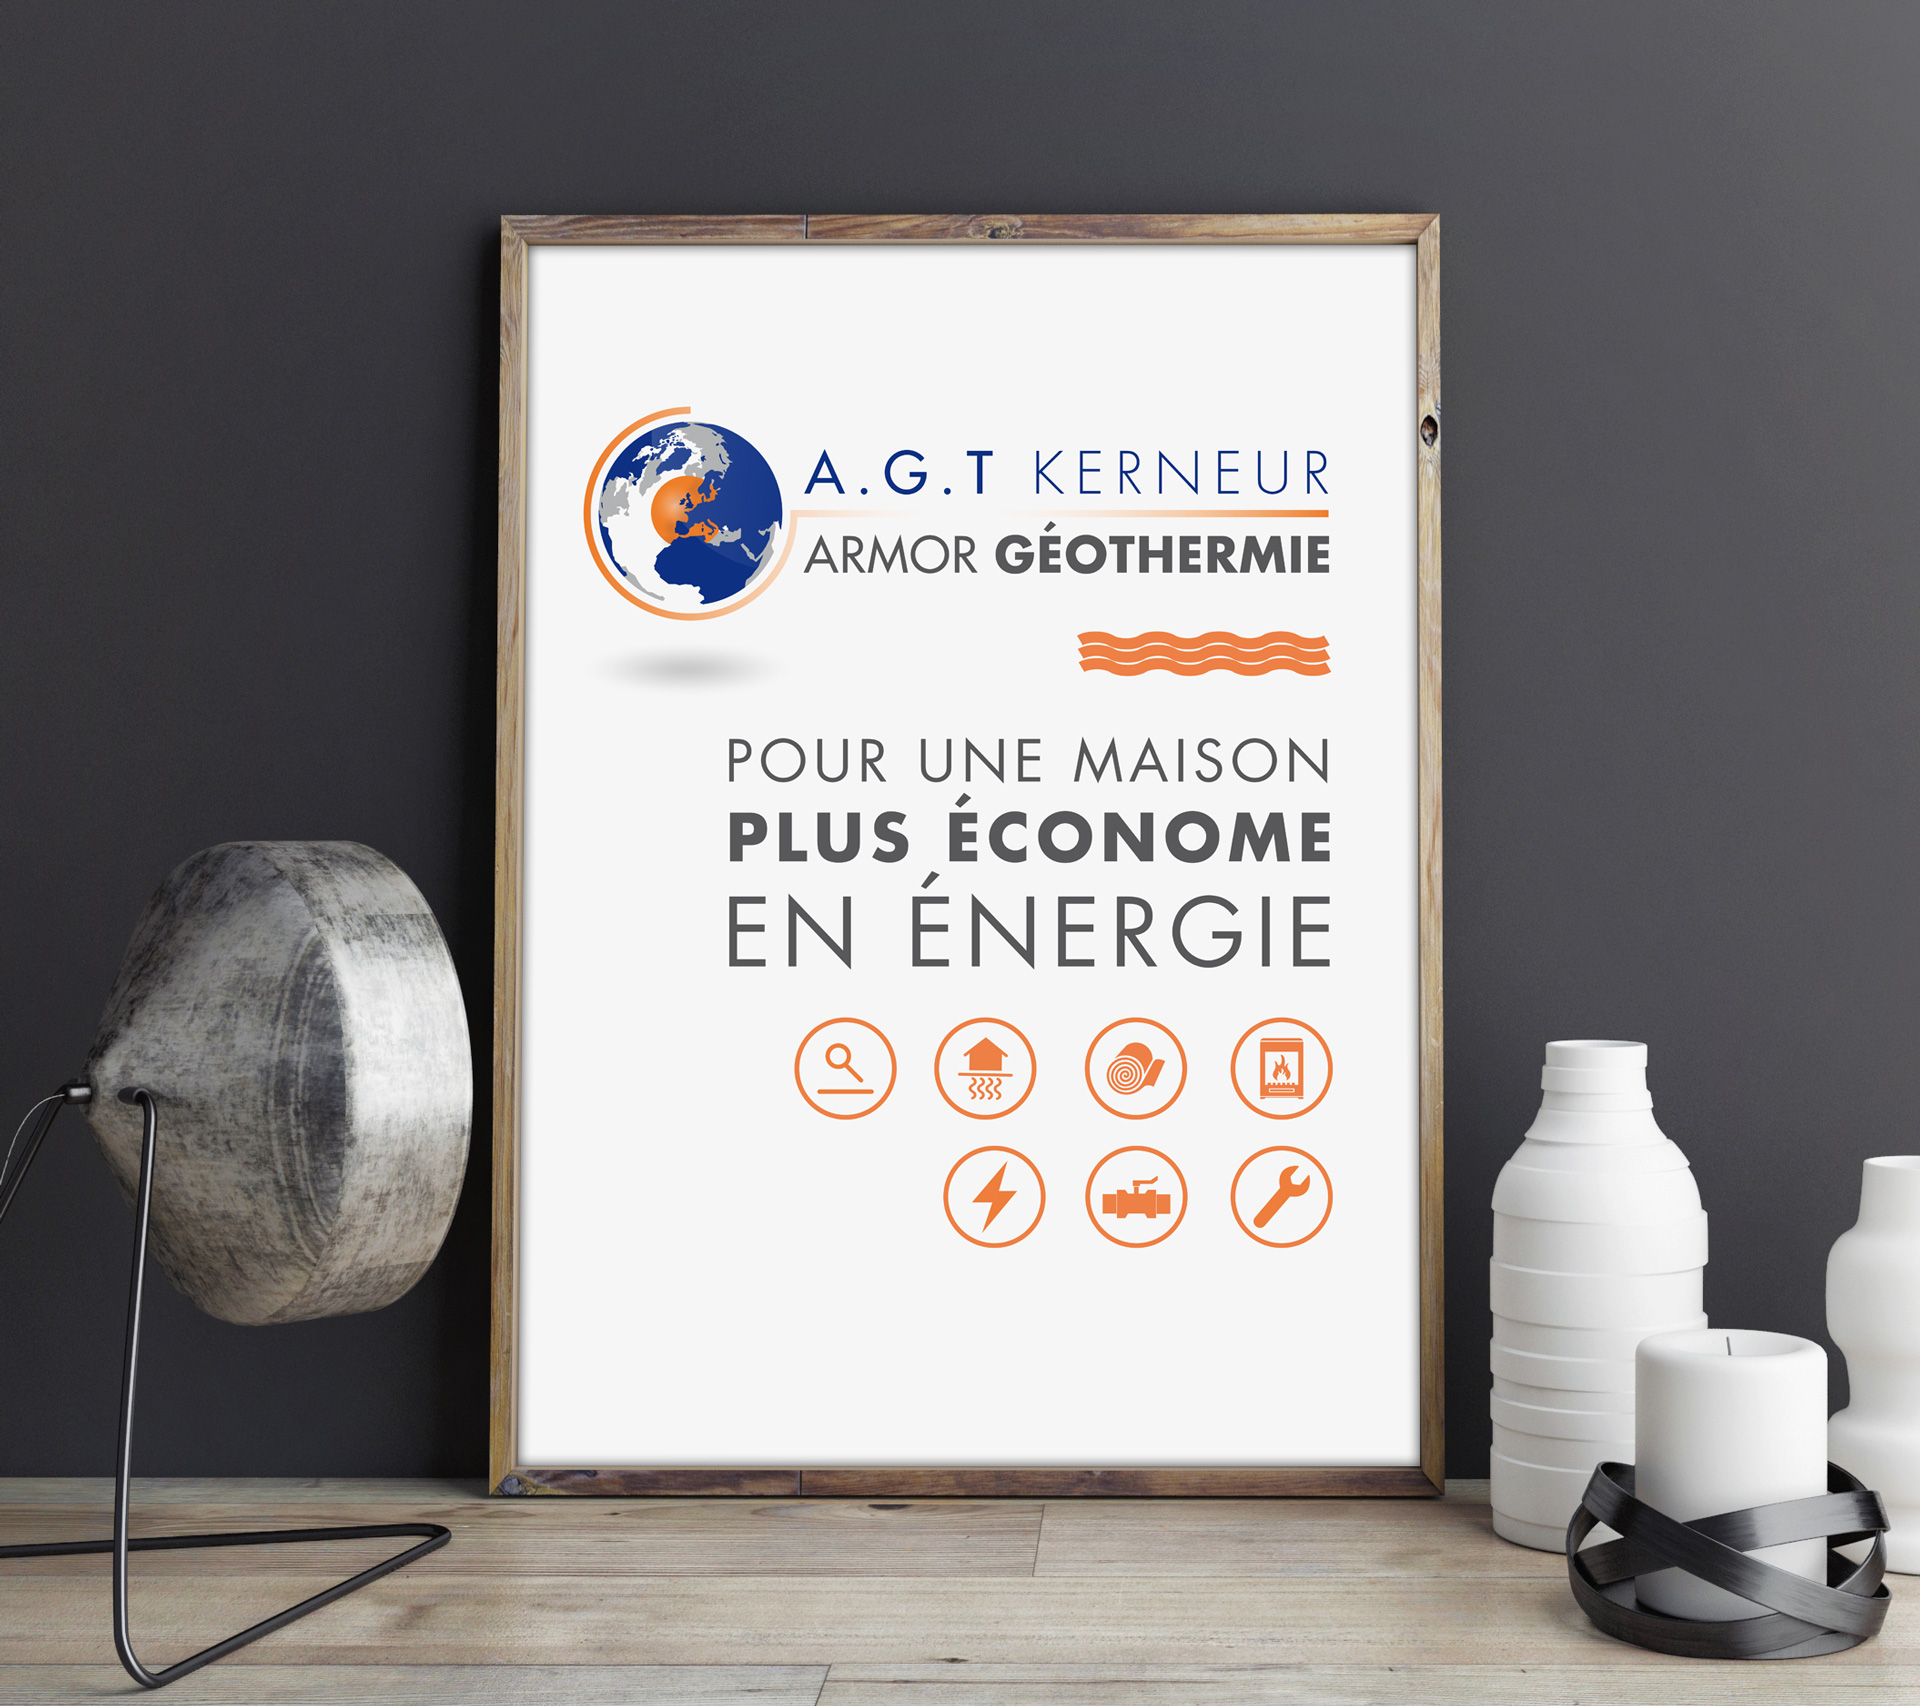 AGT-Kerneur-logo-Coqueliko